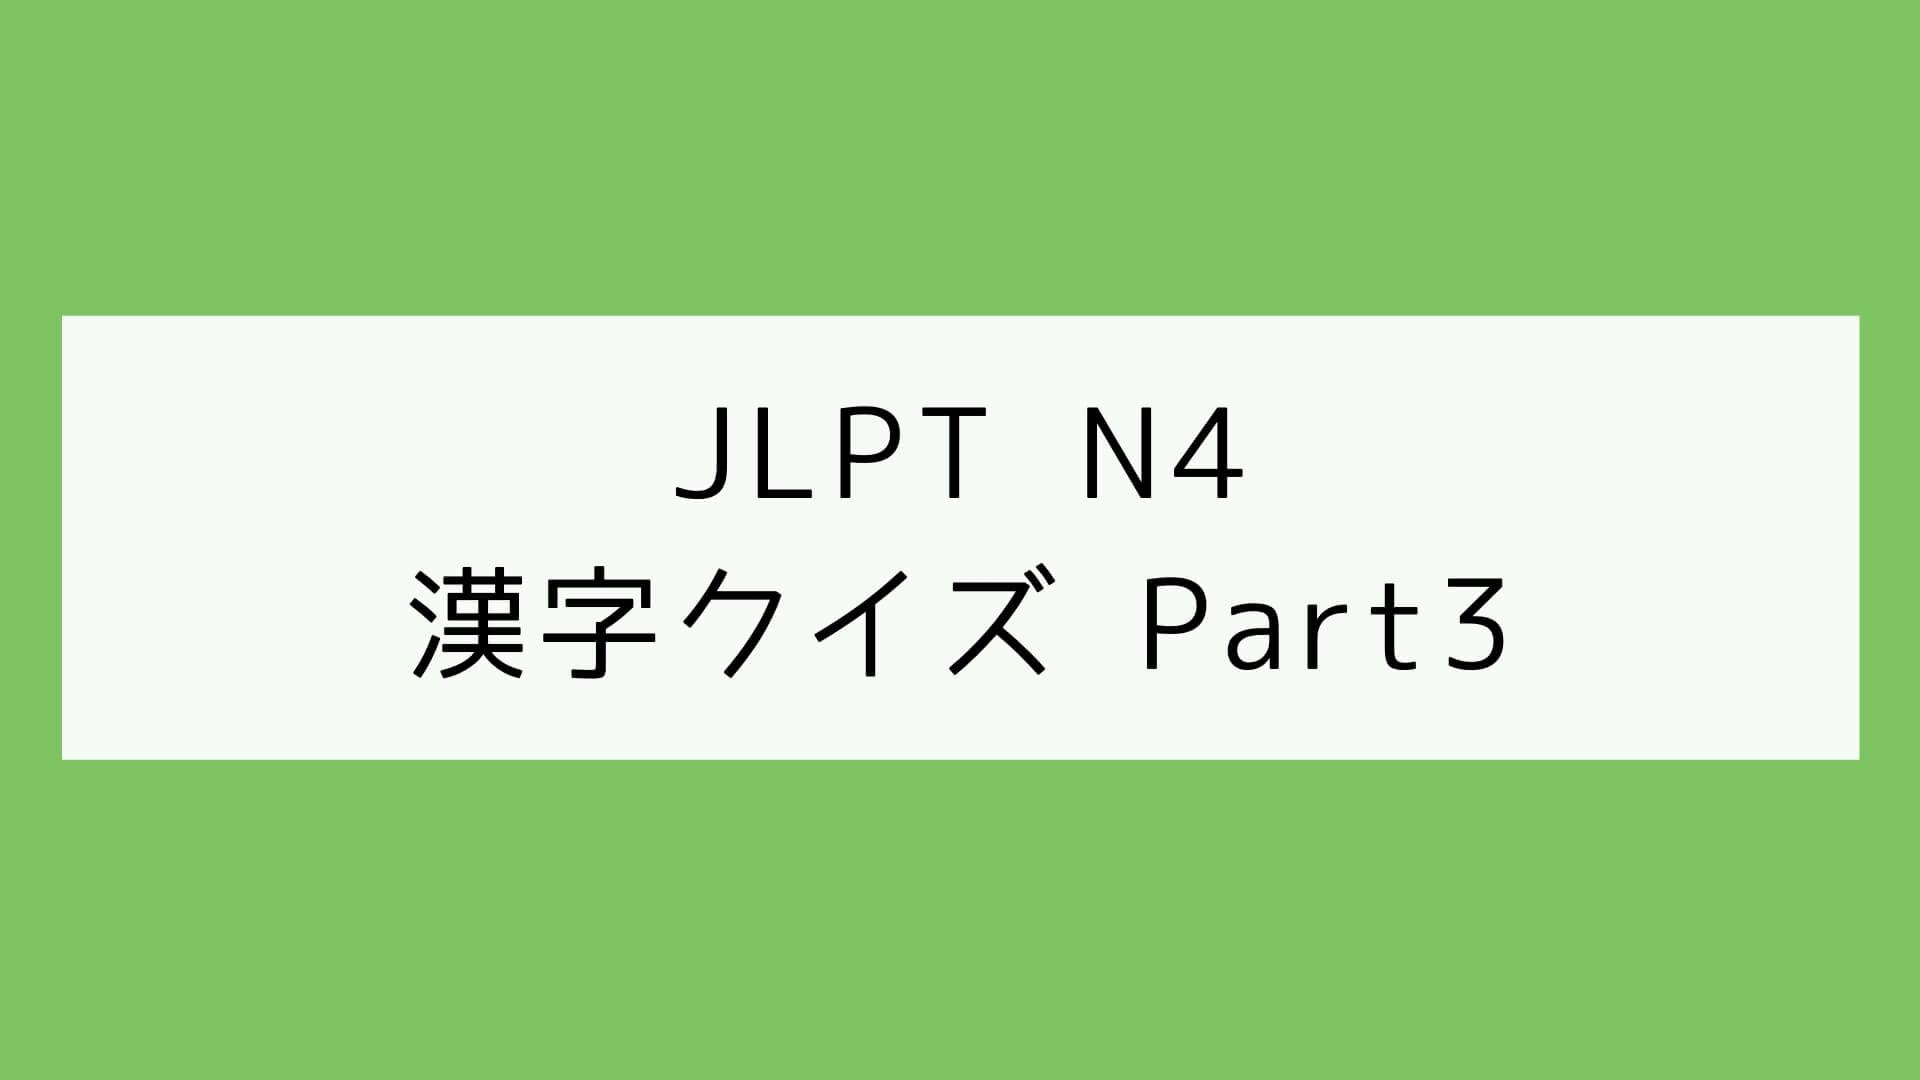 【JLPT N4】漢字クイズ Part3